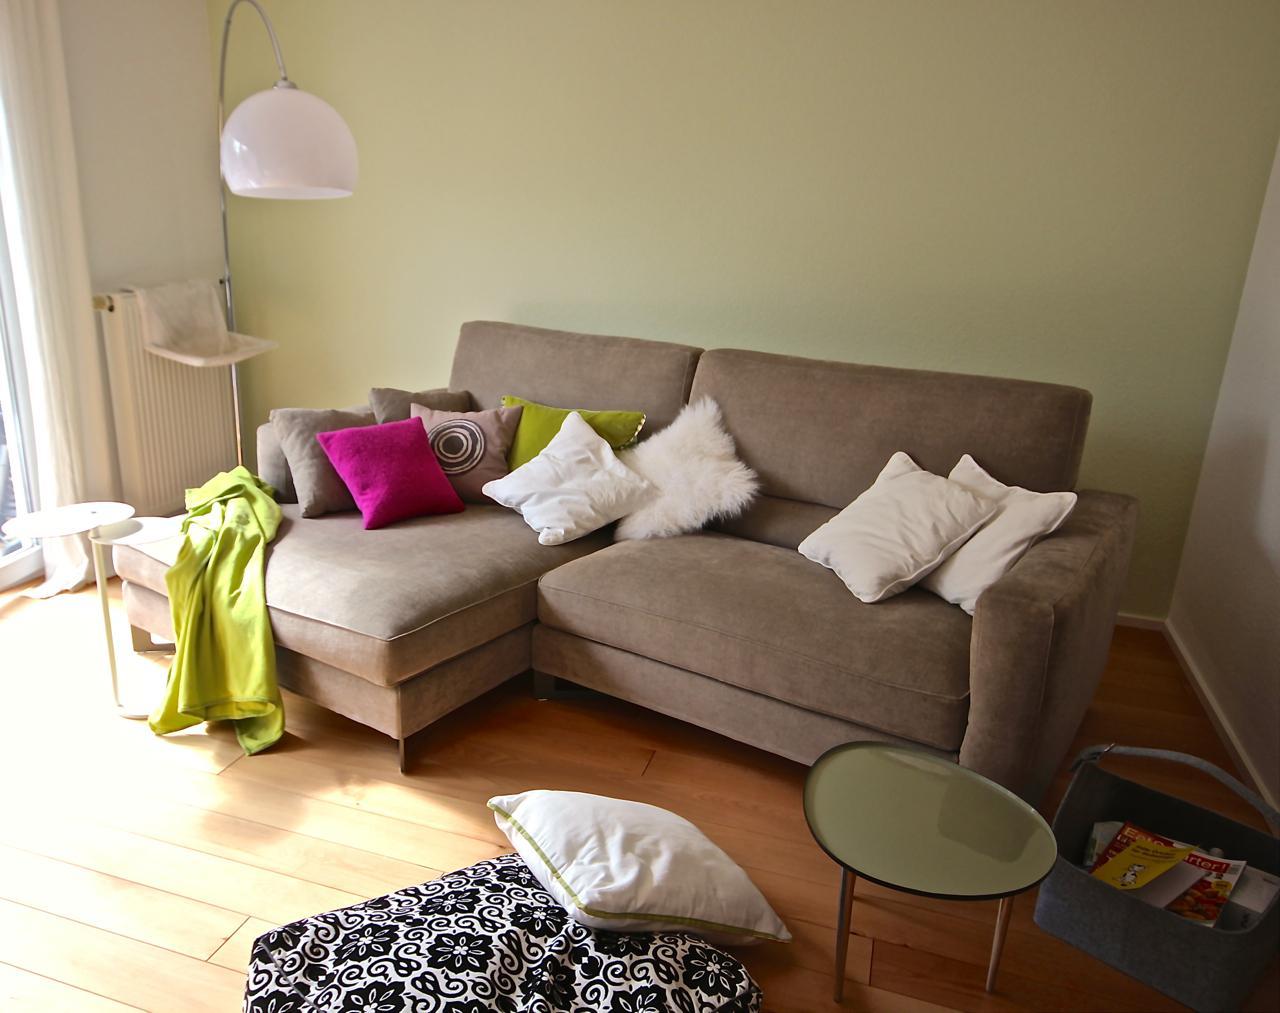 Wandfarbe Grün grüne wandfarbe bilder ideen couchstyle